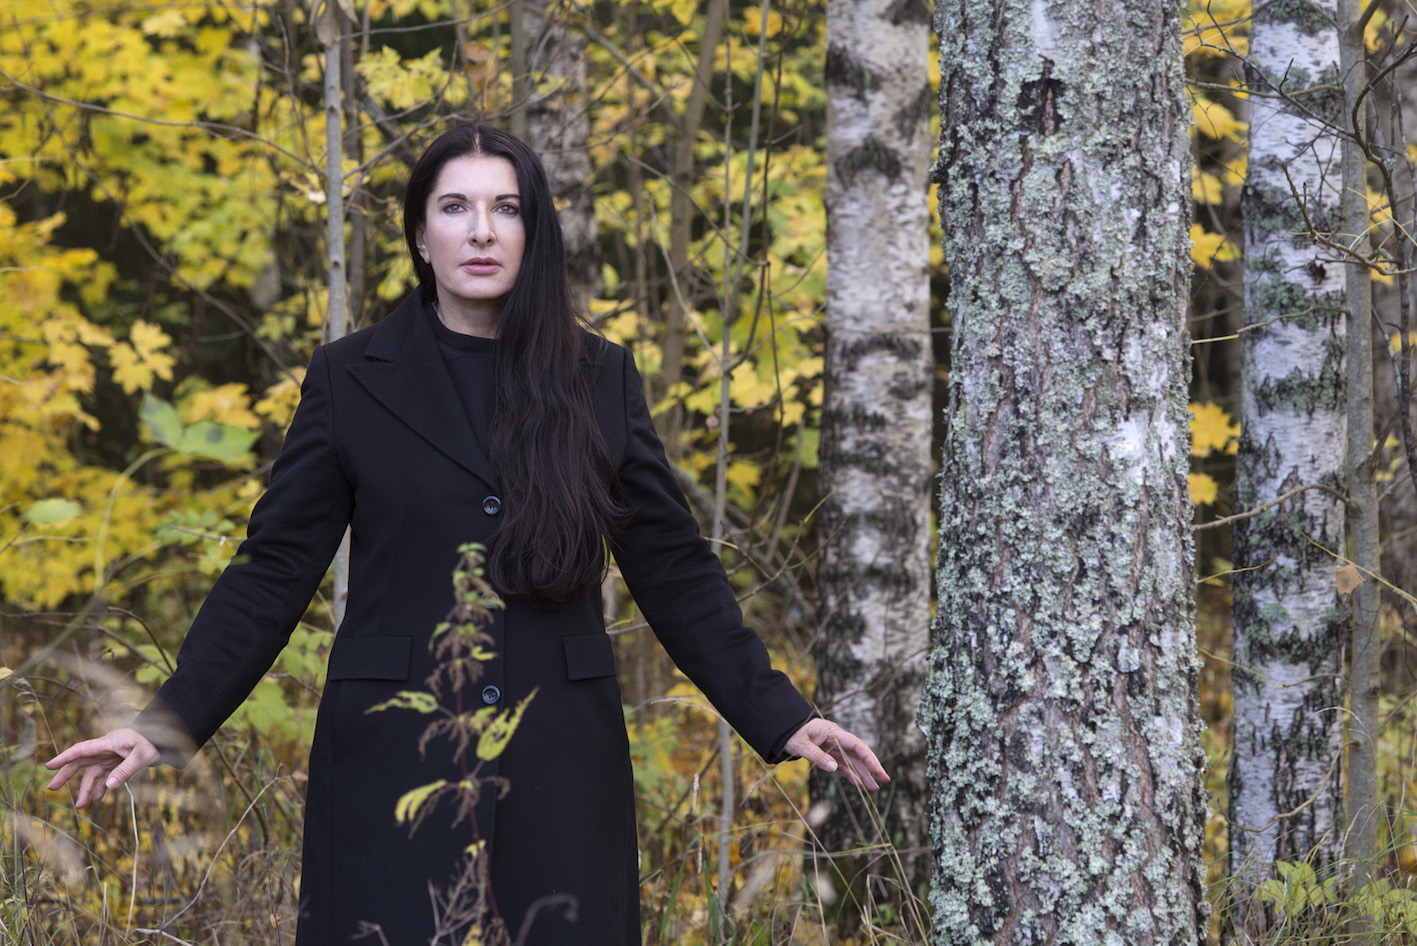 Marina Abramović, The Rest Is Silence, 2013. Photo: Knut Bry and Ekebergeparken Oslo.